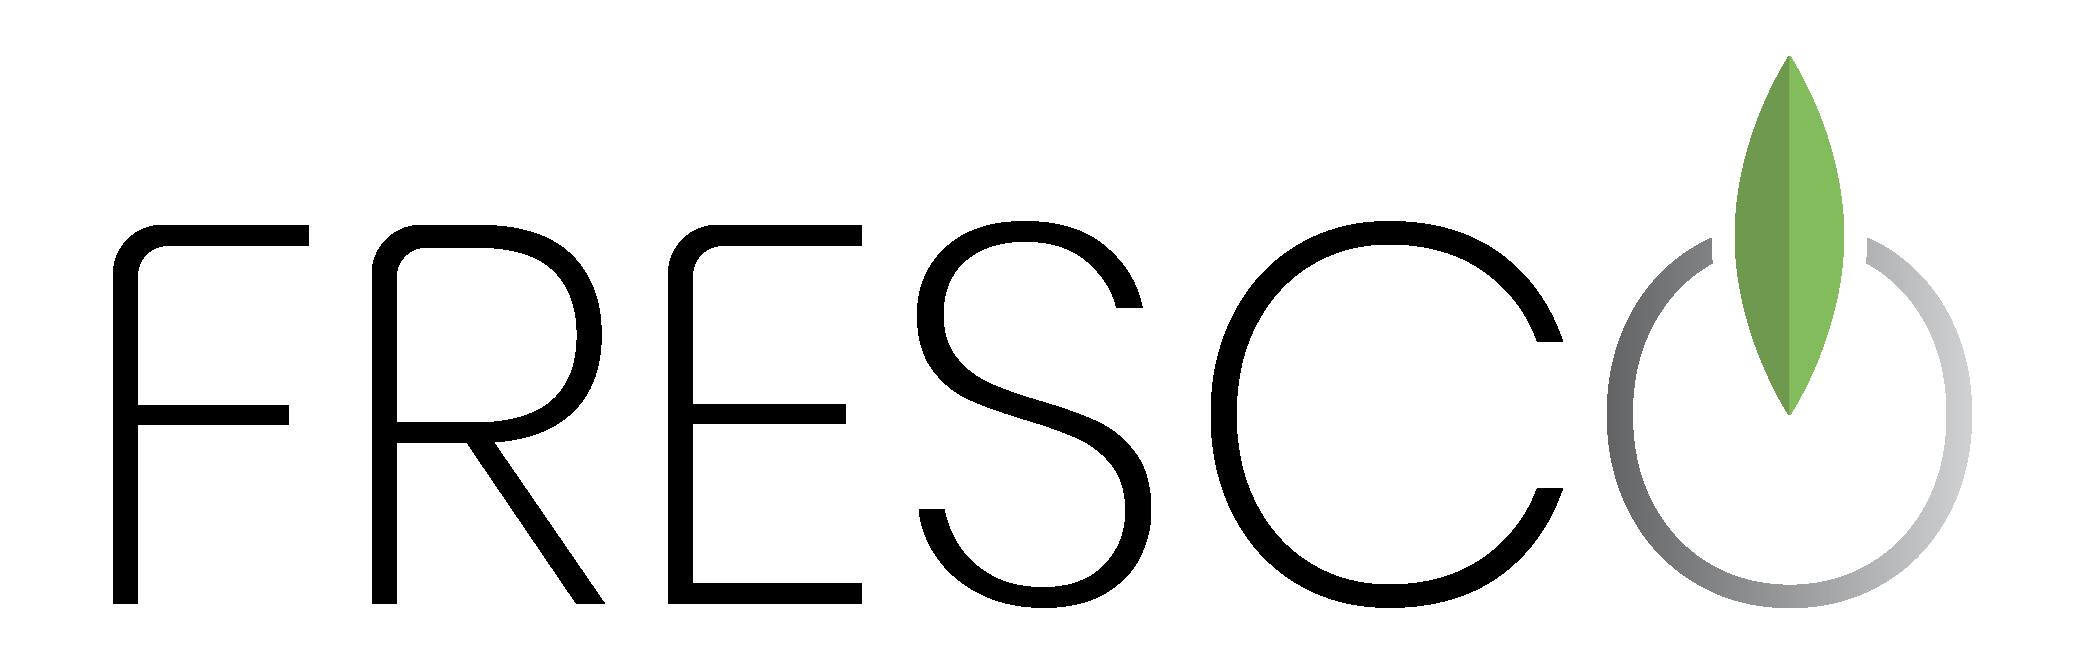 logo fresco